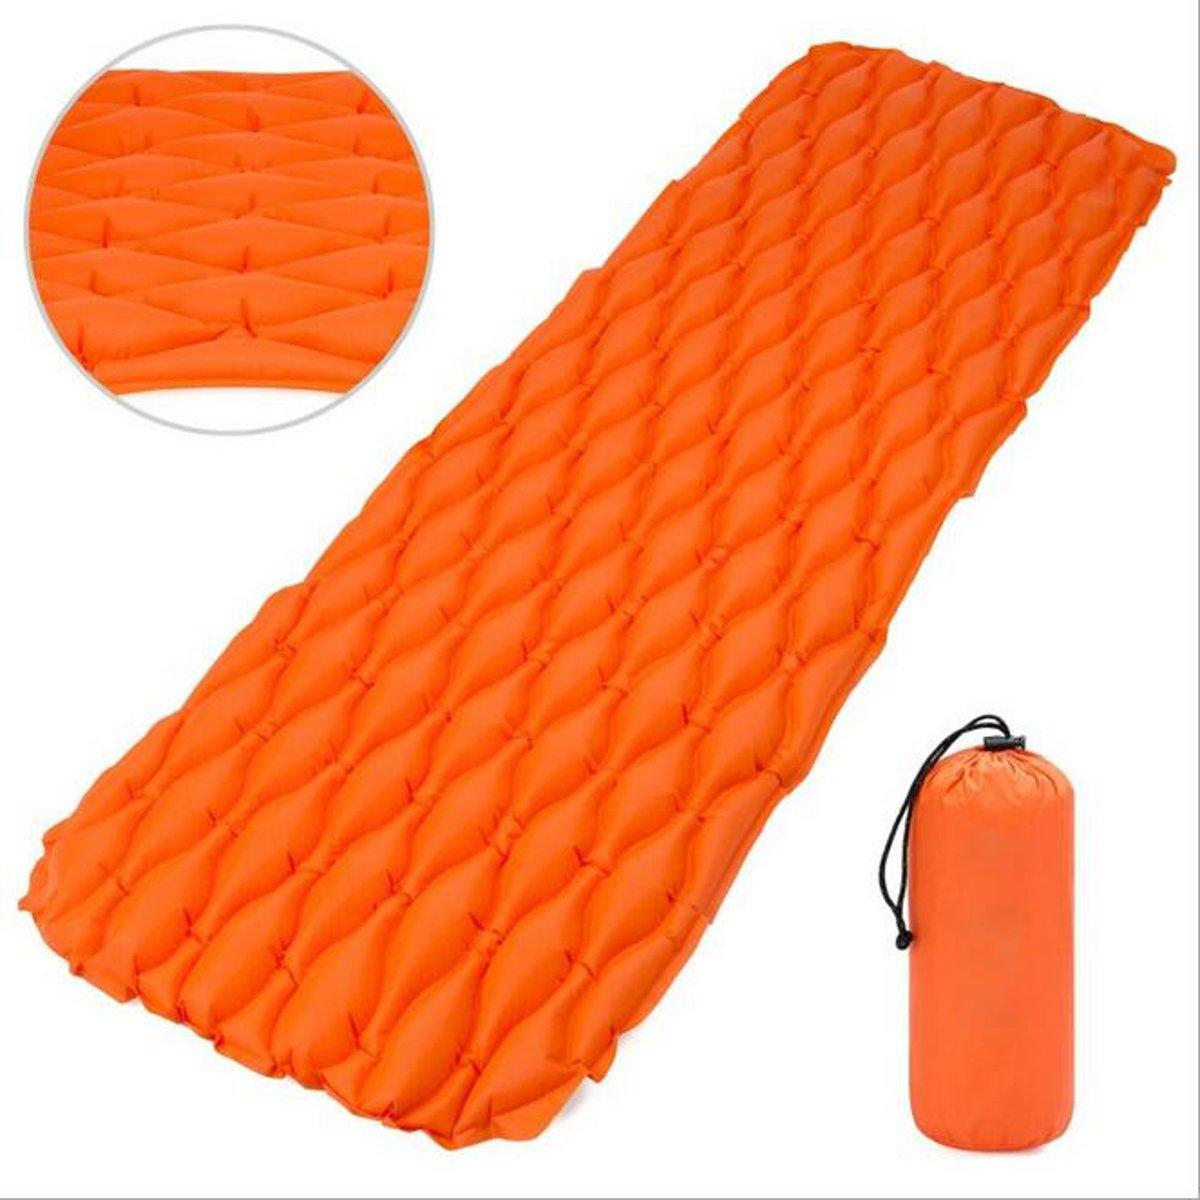 Portable Inflatable Mattress Outdoor Camping Pad Compact Sleeping Mat Ultralight